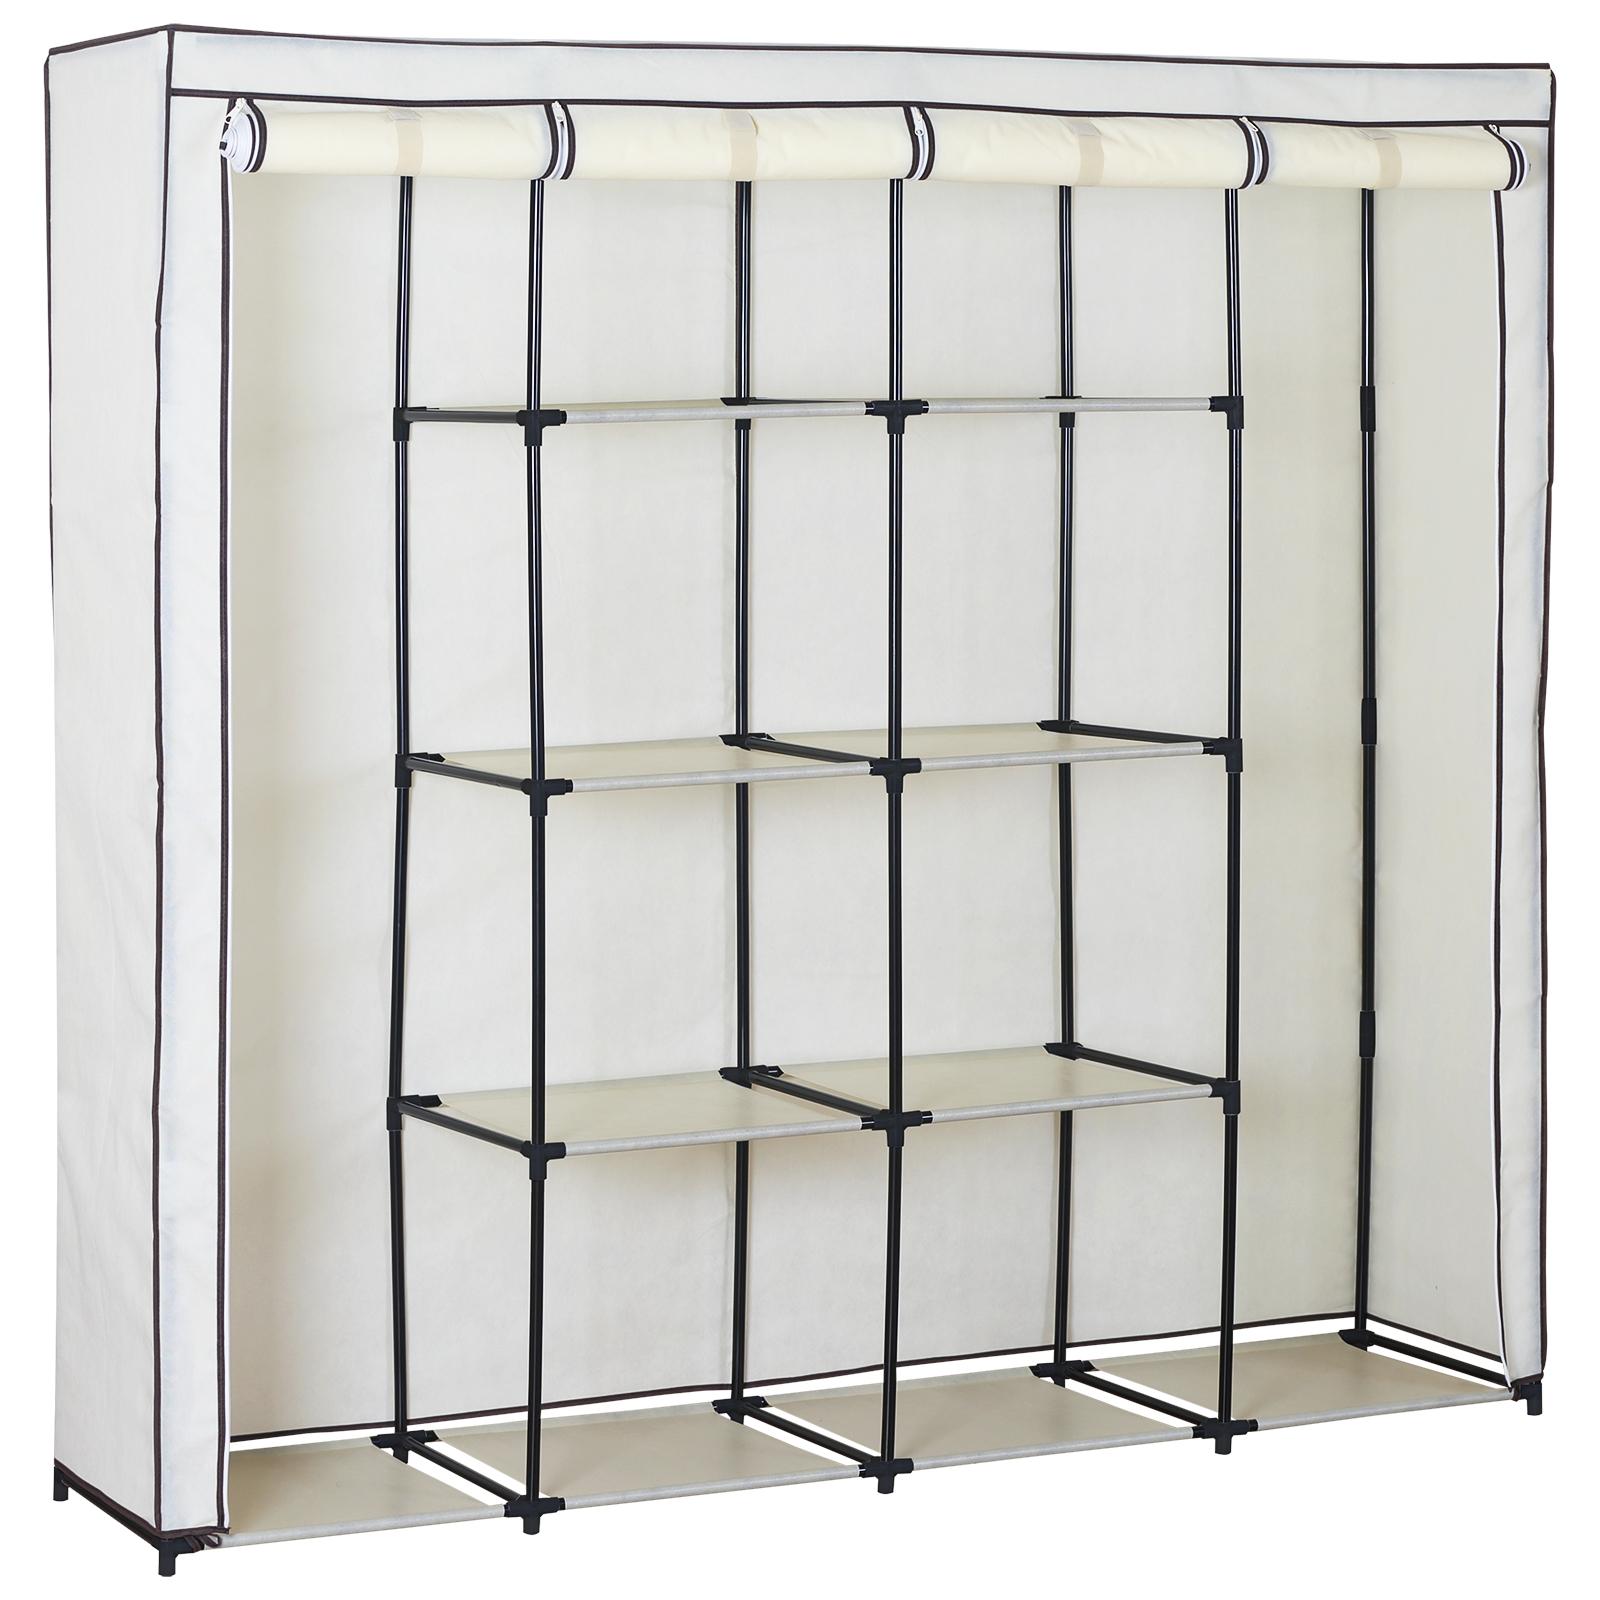 kleiderschrank garderobenschrank campingschrank. Black Bedroom Furniture Sets. Home Design Ideas